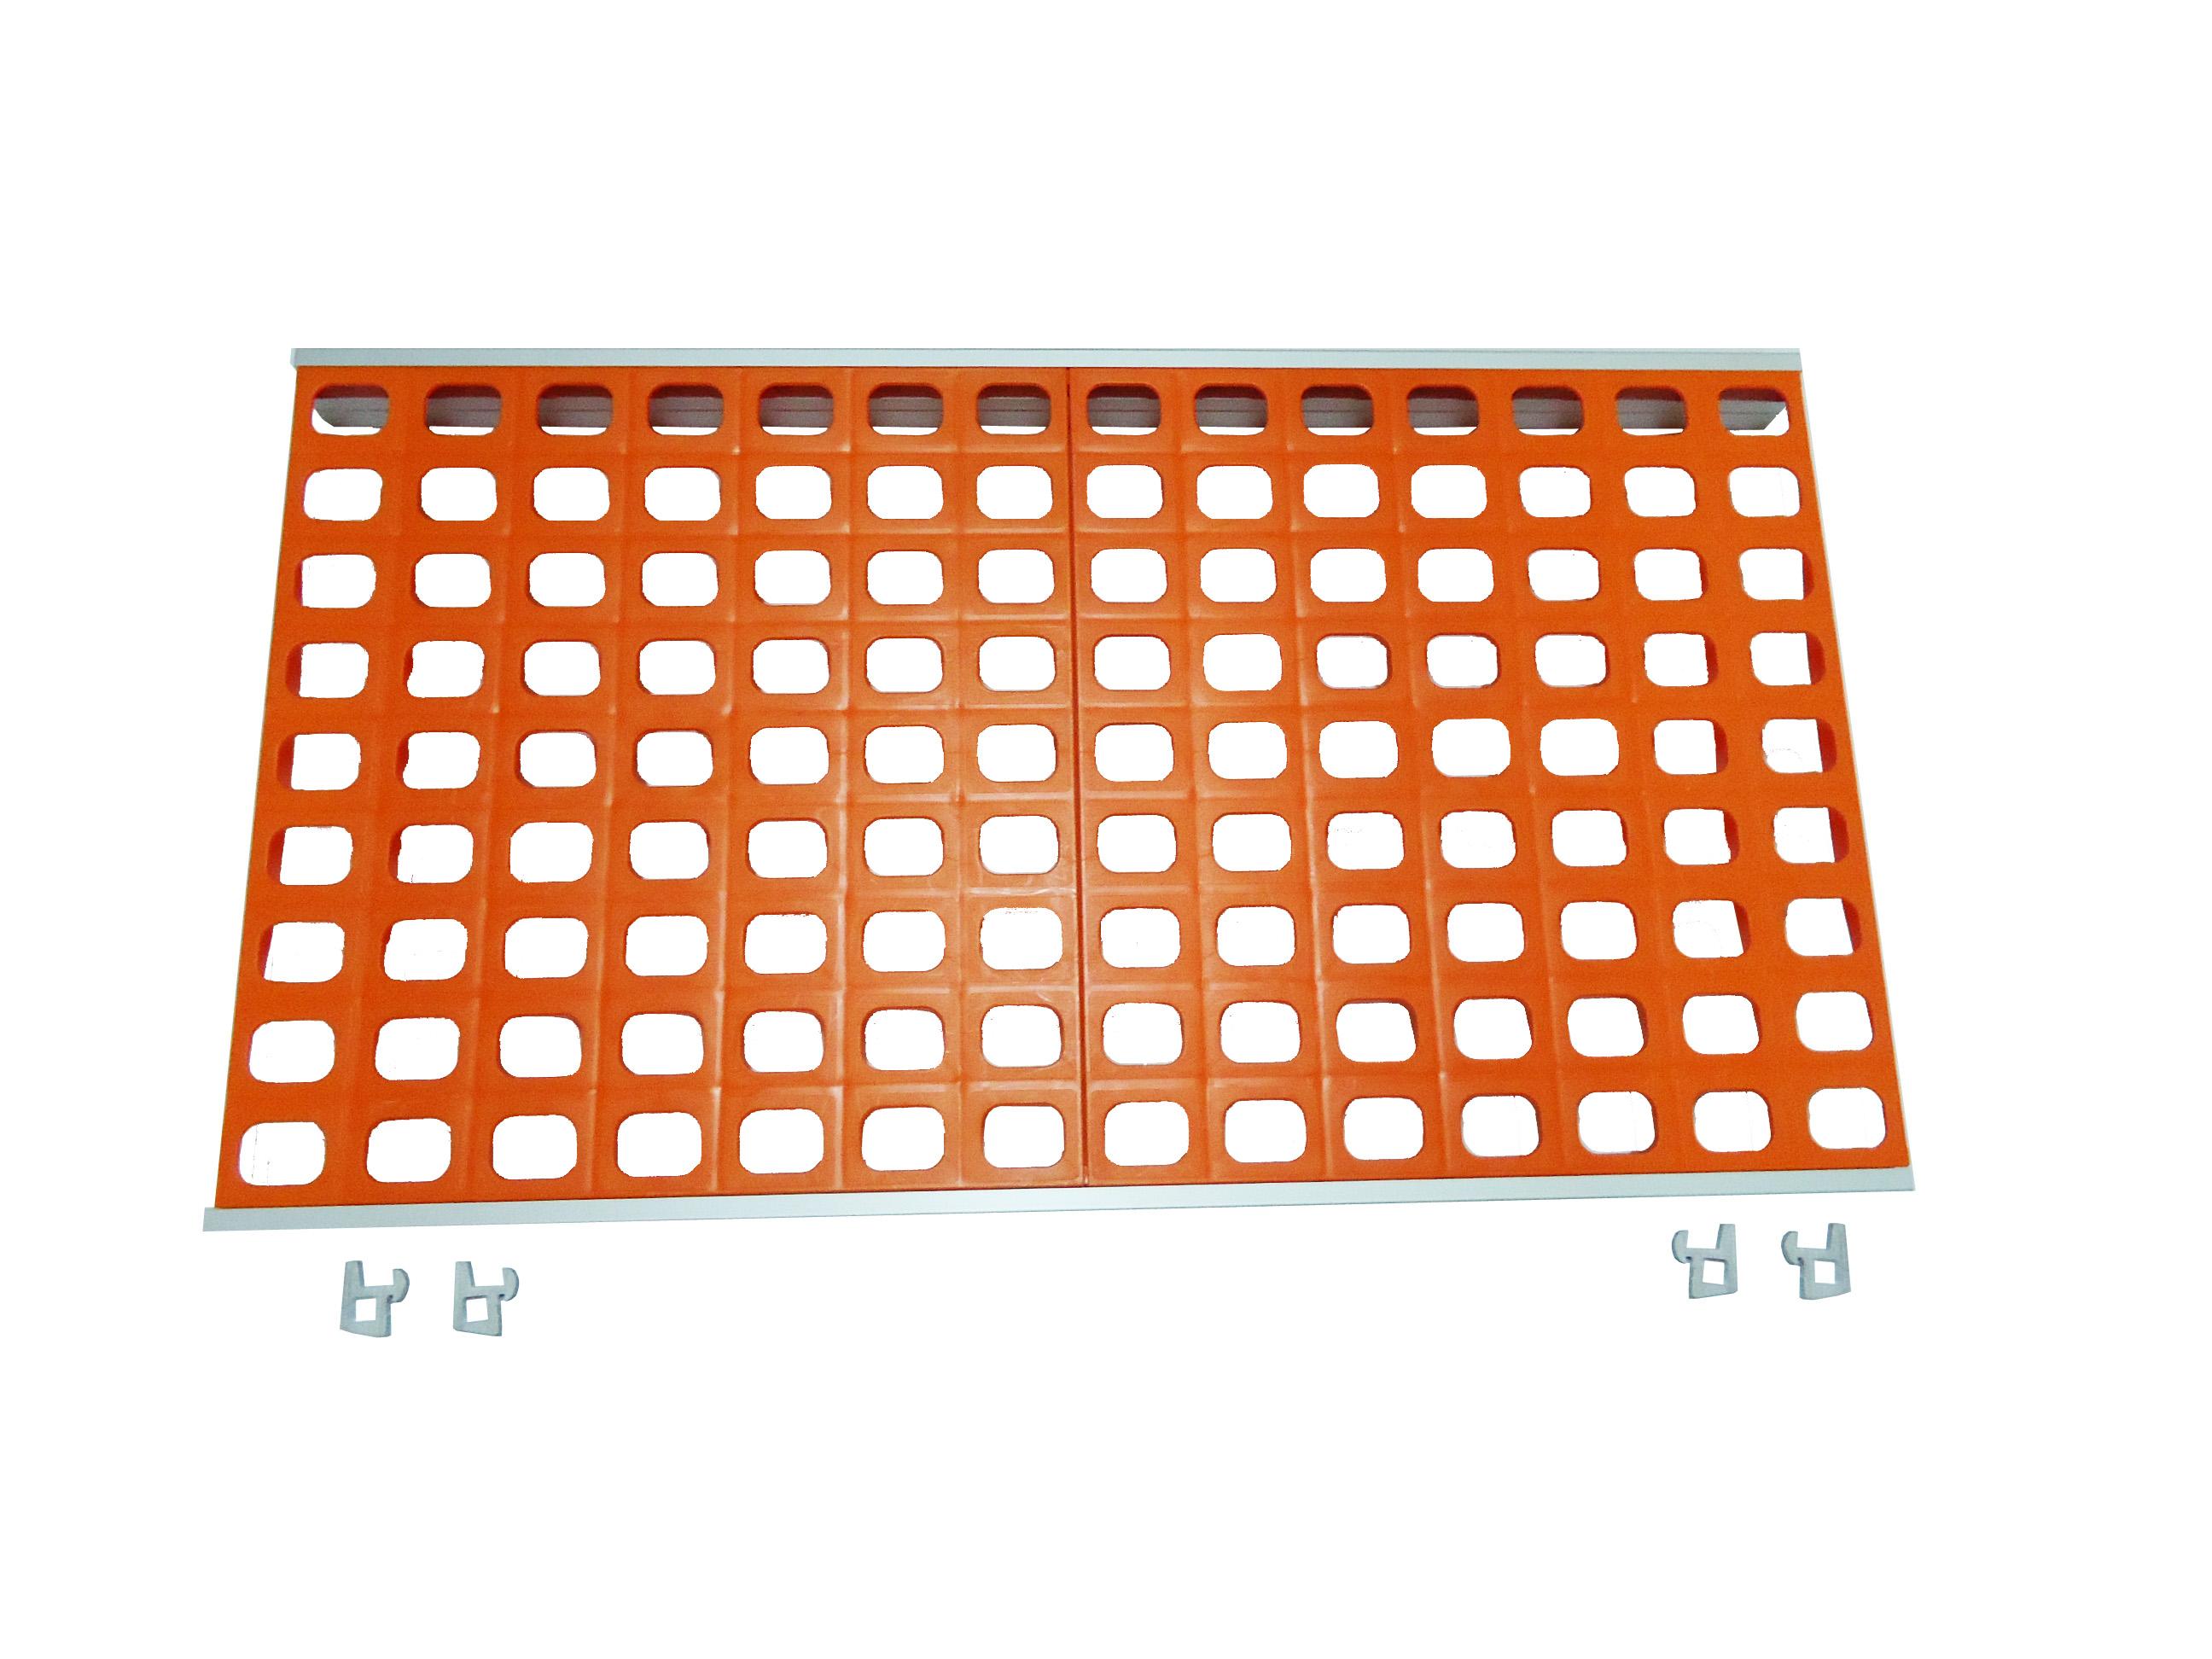 Coolblok KOPA4794C Ραφιέρα - Ράφι Ψυκτικών Θαλάμων Μονό Πολυαιθυλενίου - 940x470 ψυκτικοί θάλαμοι    ράφια ψυκτικών θαλάμων  ψυκτικοί θάλαμοι    ράφια ψυκτικών θ